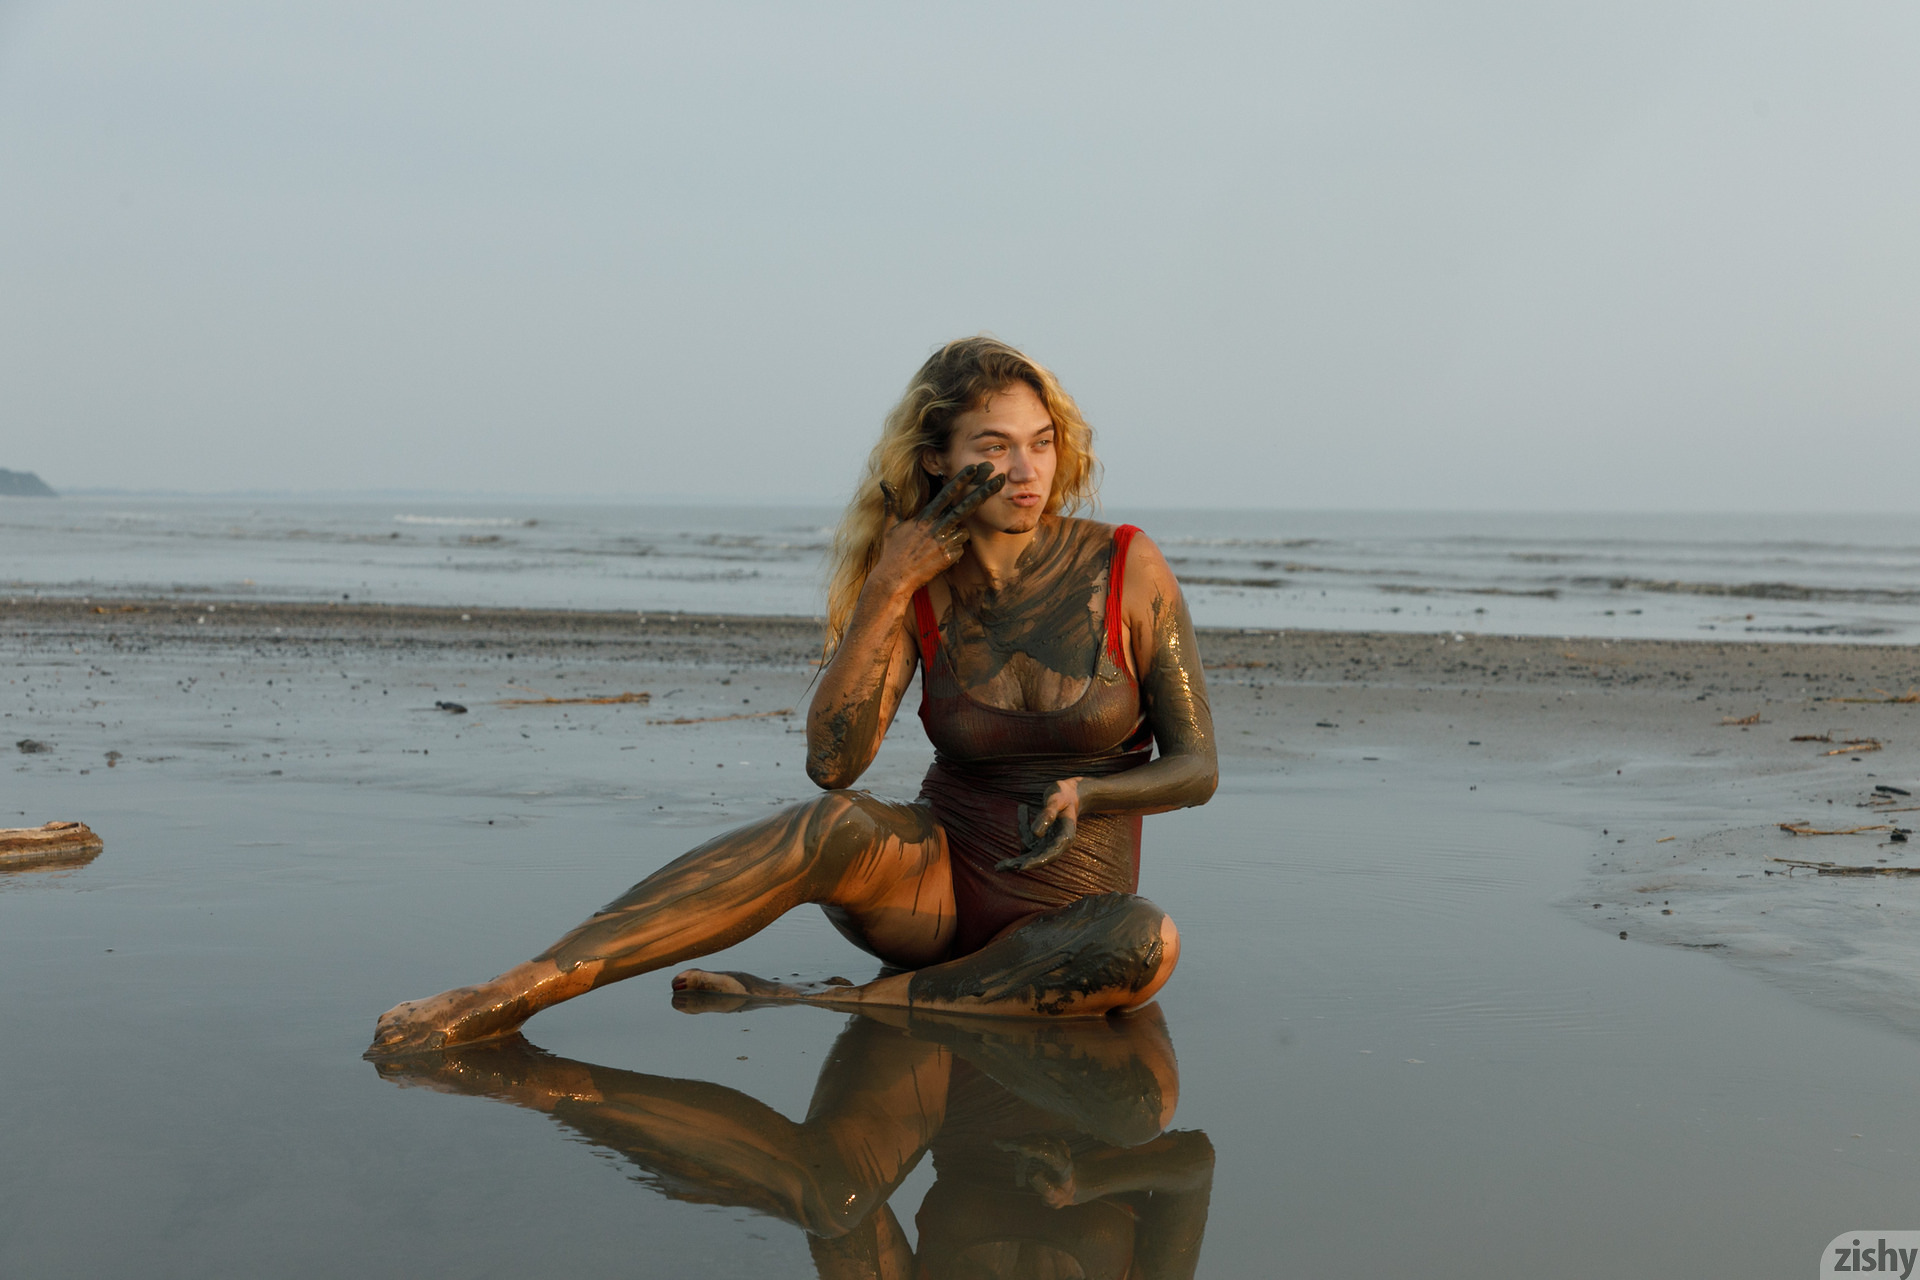 Sofia Orlova On Gryaznyy Beach Zishy (34)